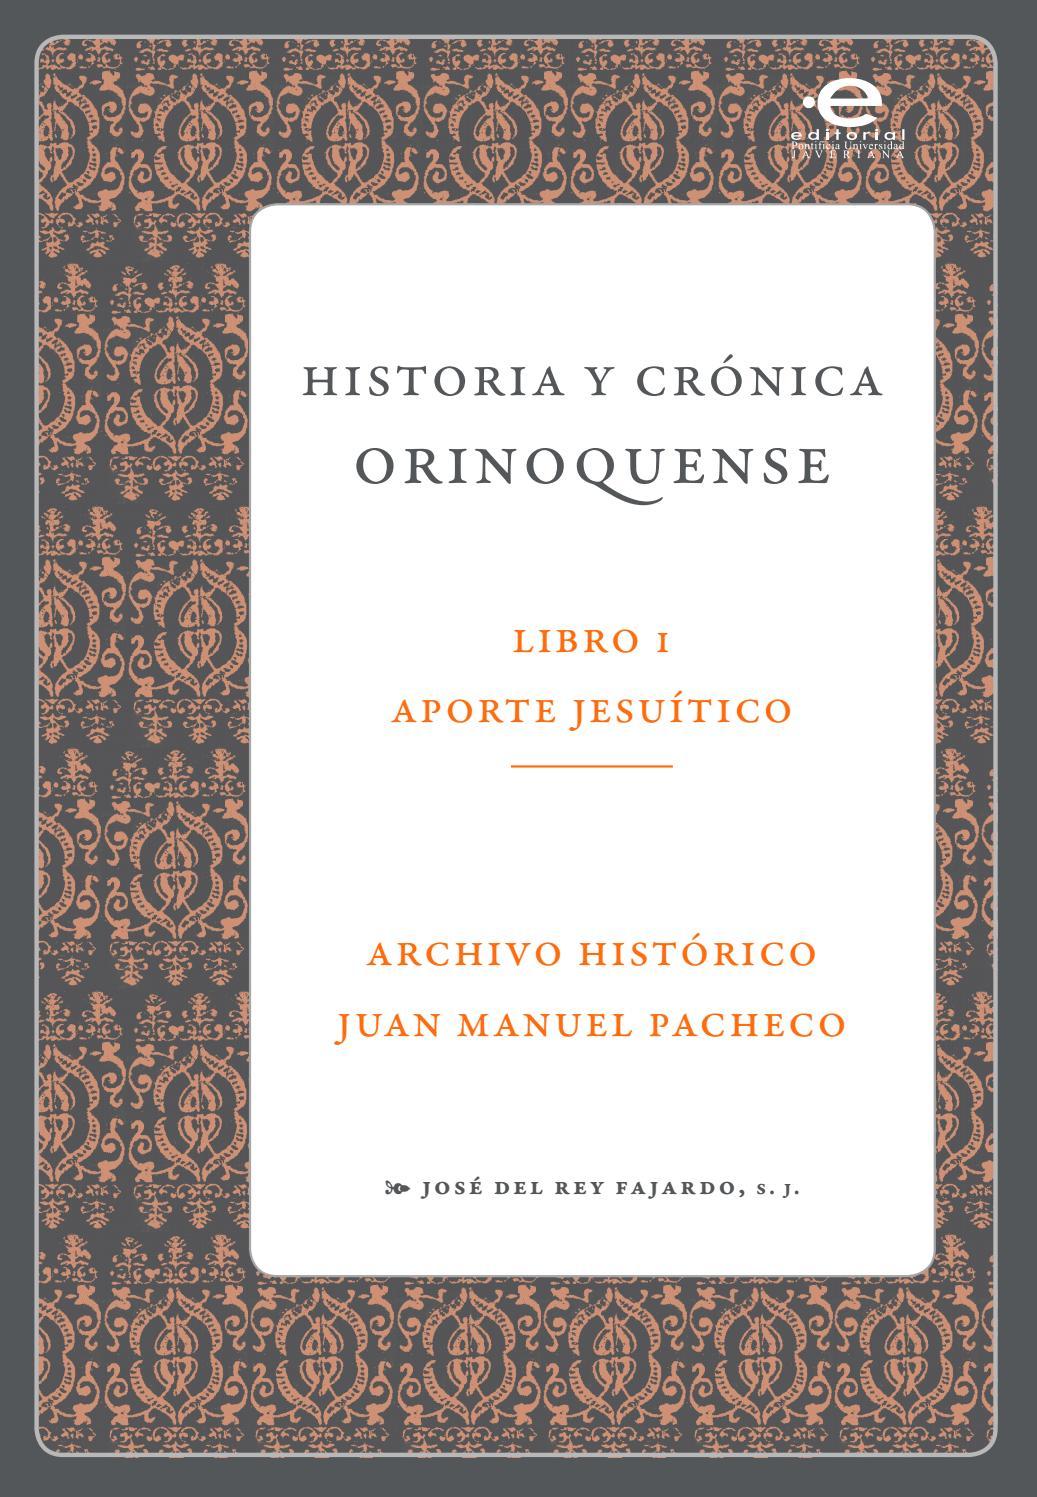 Historia y crónica orinoquense, Libro 1: Aporte Jesuítico by Archivo ...